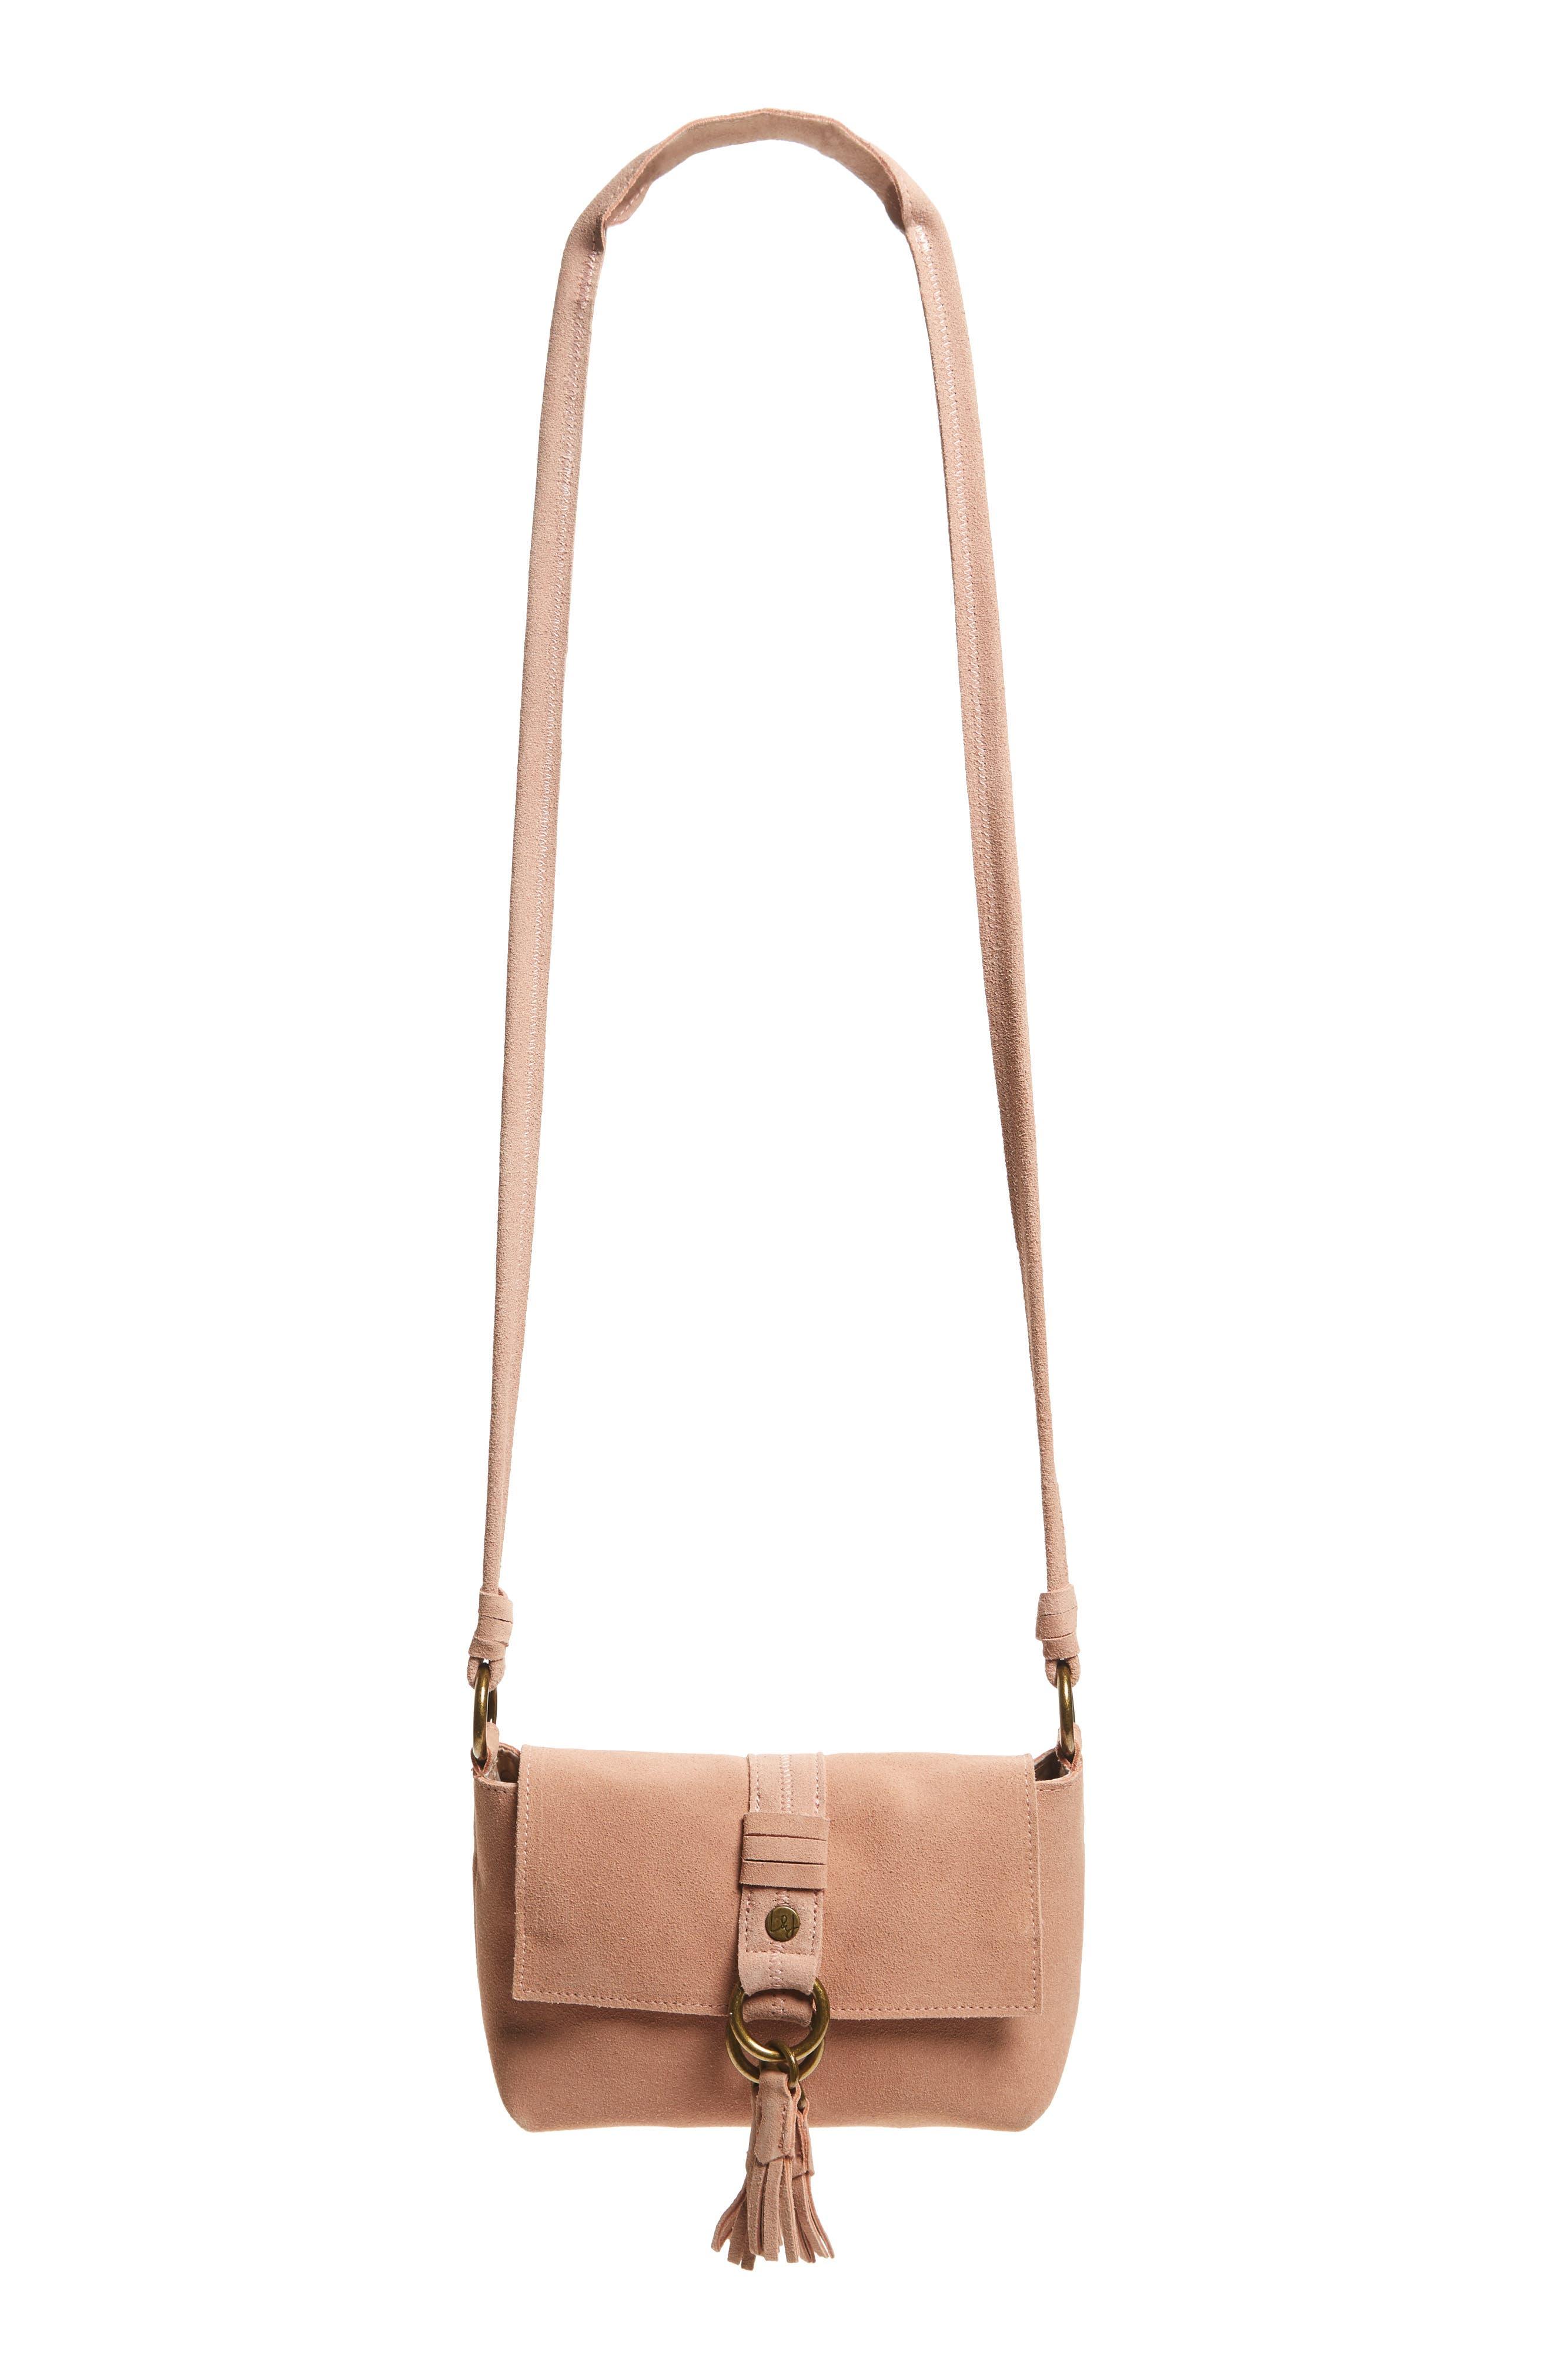 ELLE & JAE GYPSET Wildleder Leather Crossbody Bag